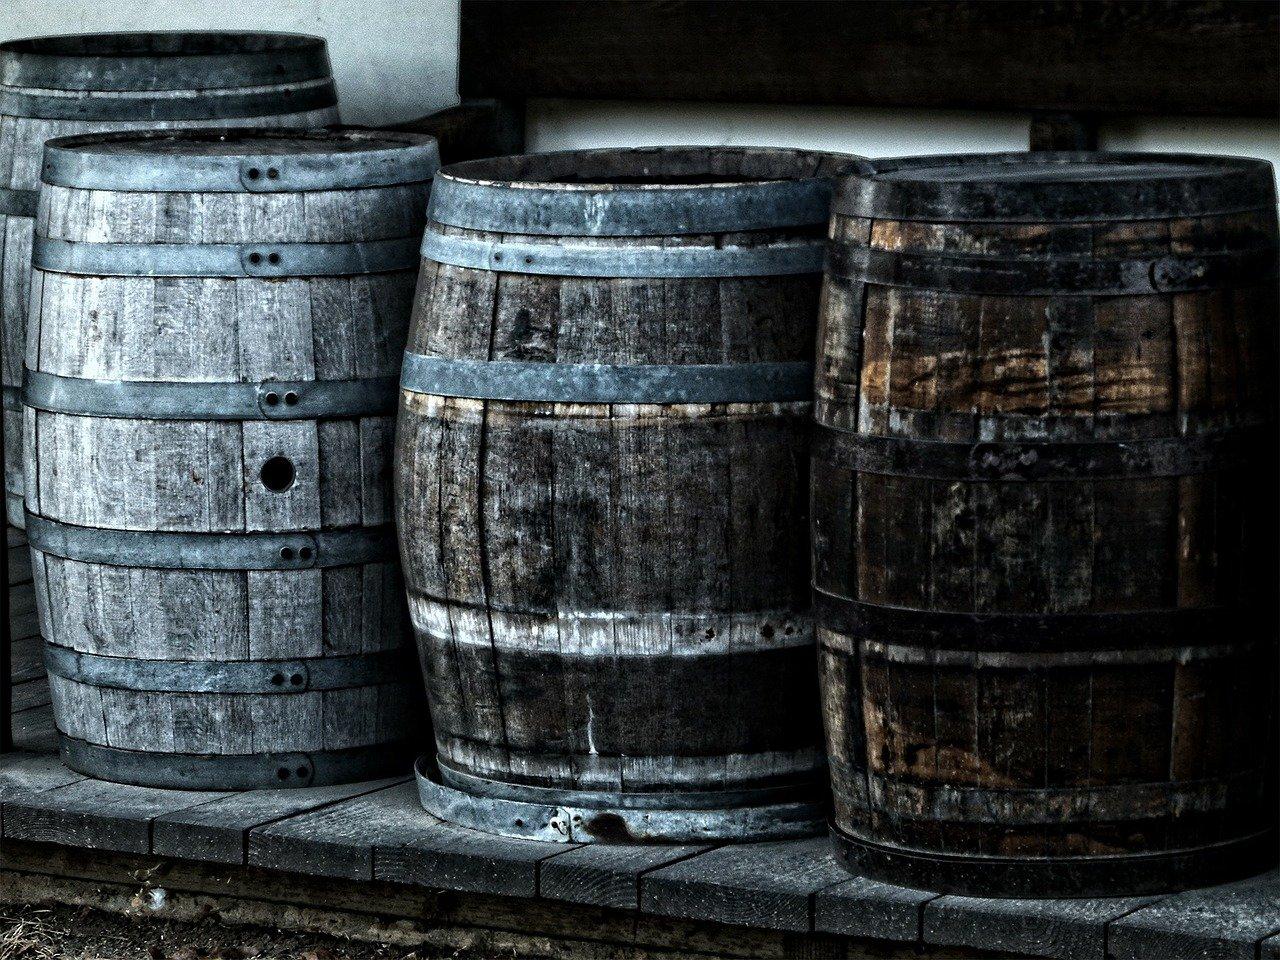 barriles, barricas, contenedores de vino